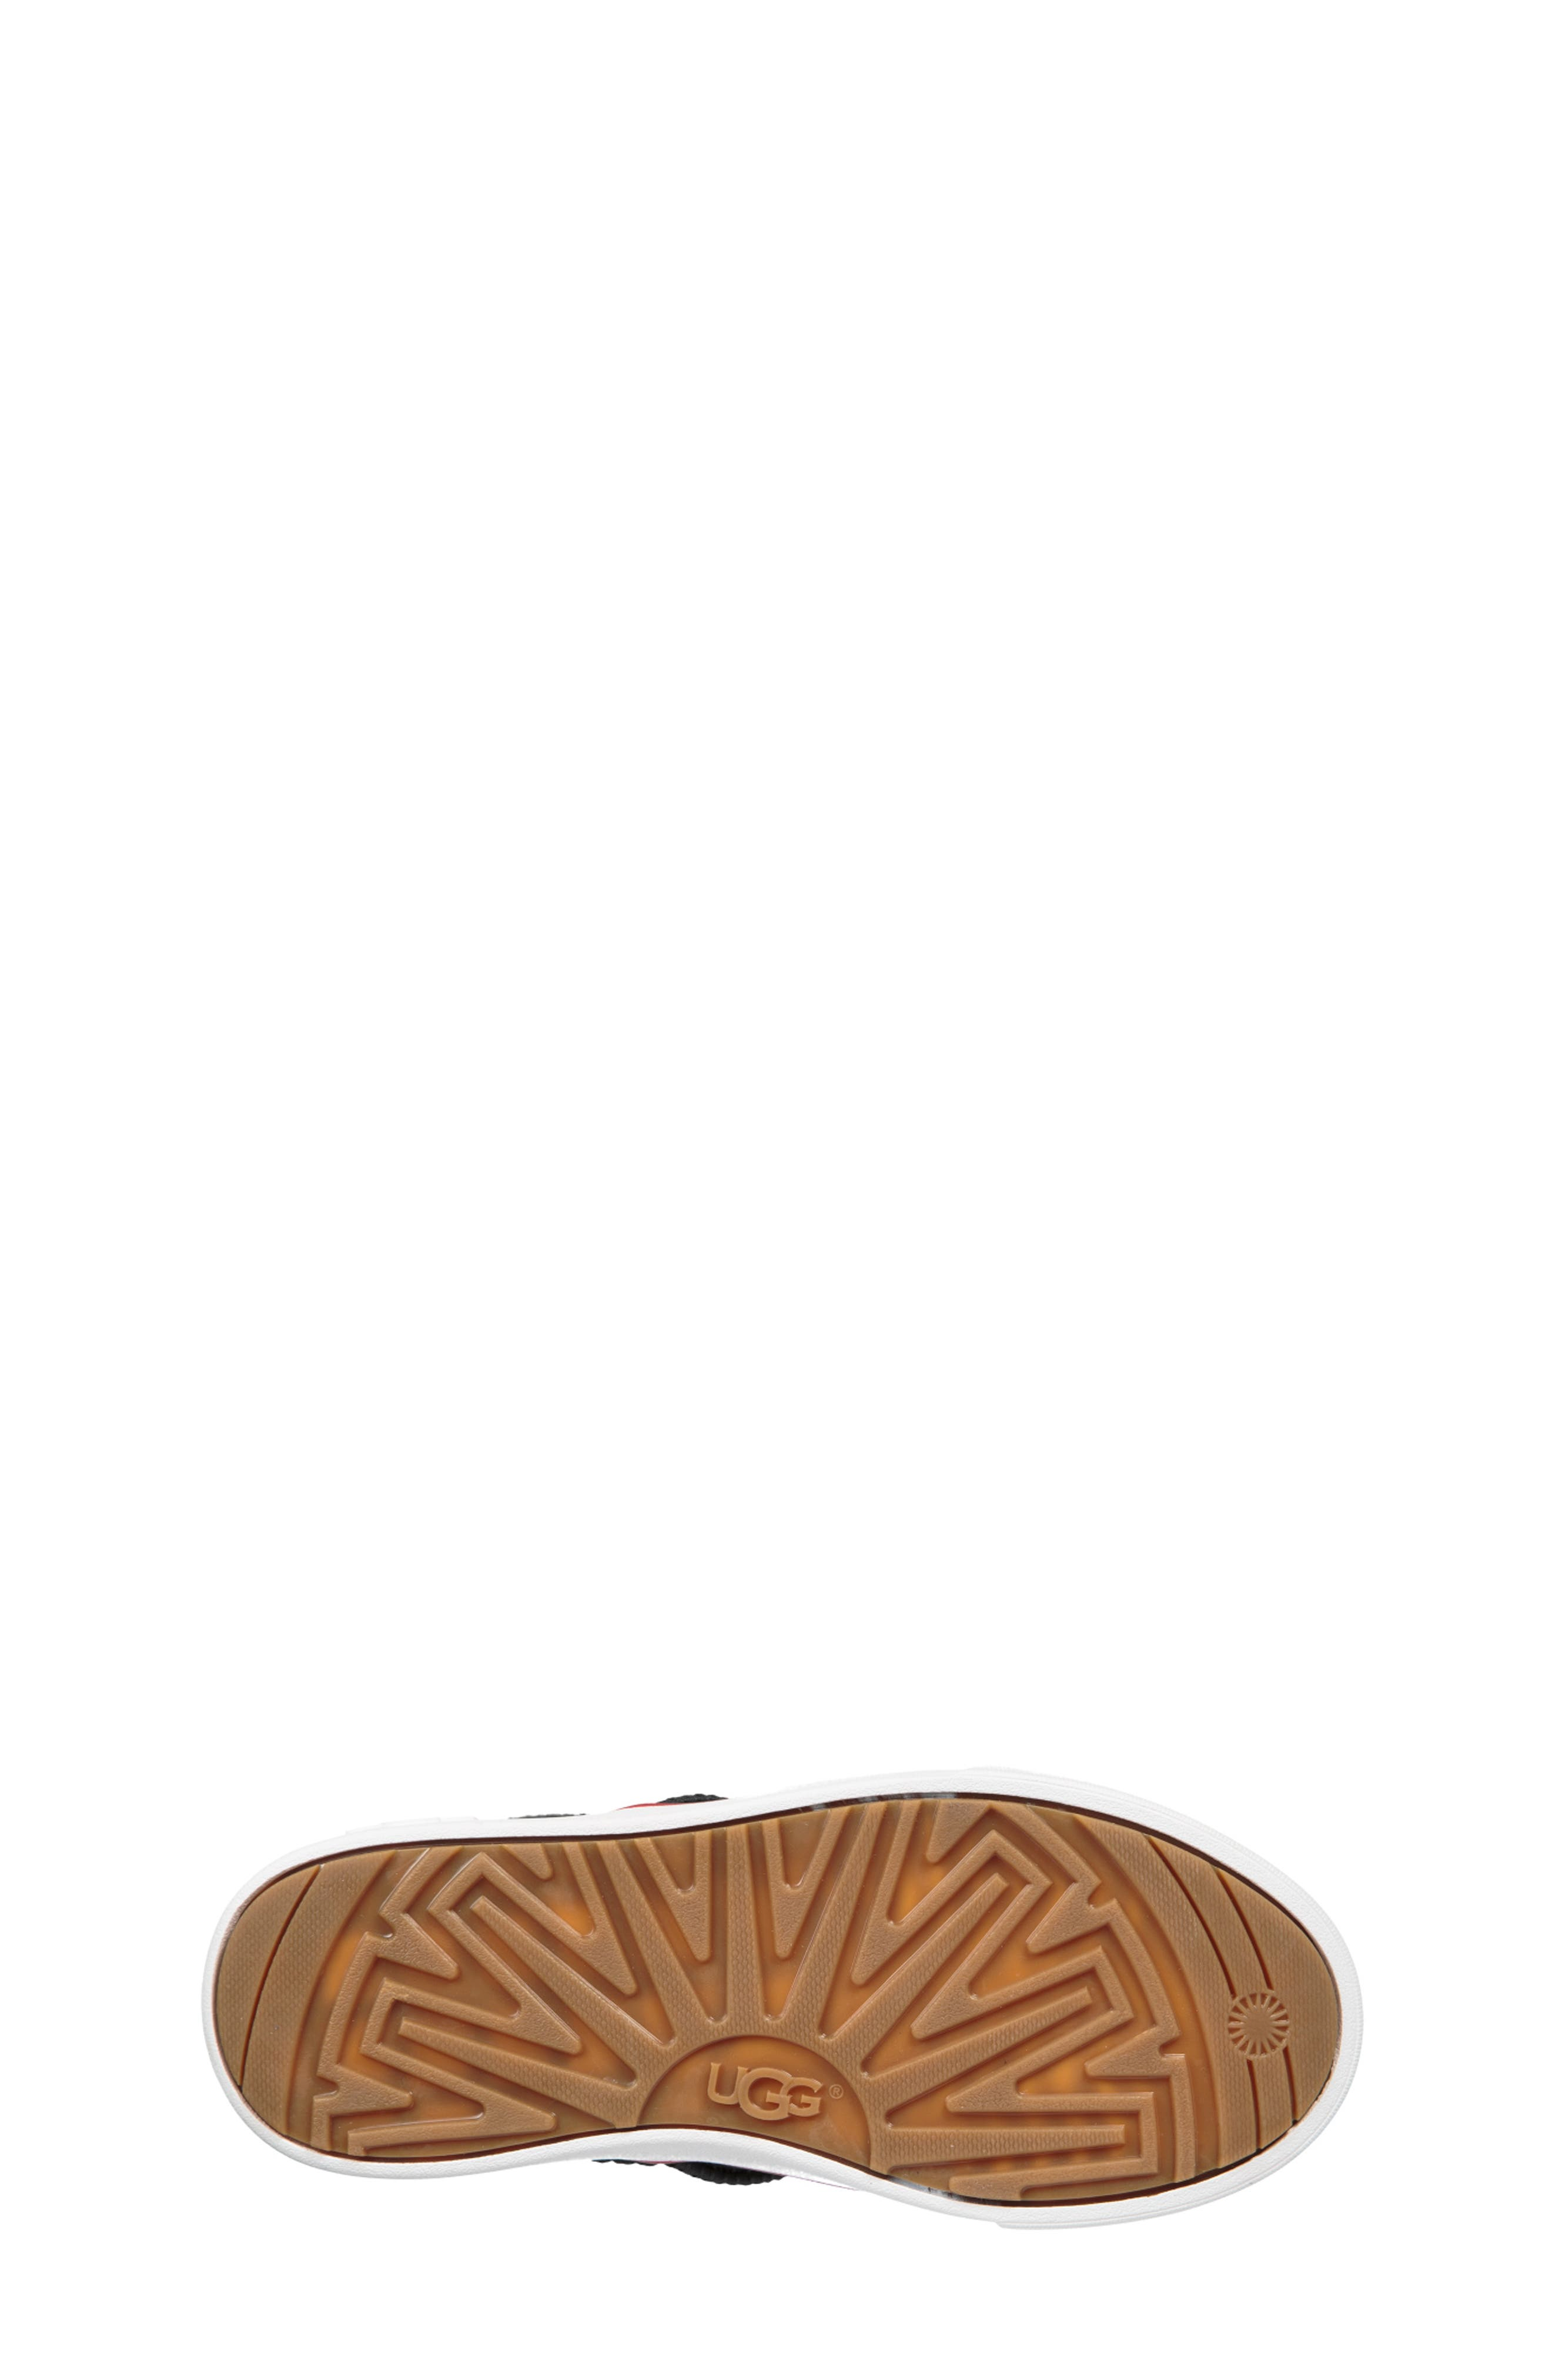 UGG<SUP>®</SUP>, Boscoe Sneaker, Alternate thumbnail 5, color, 001